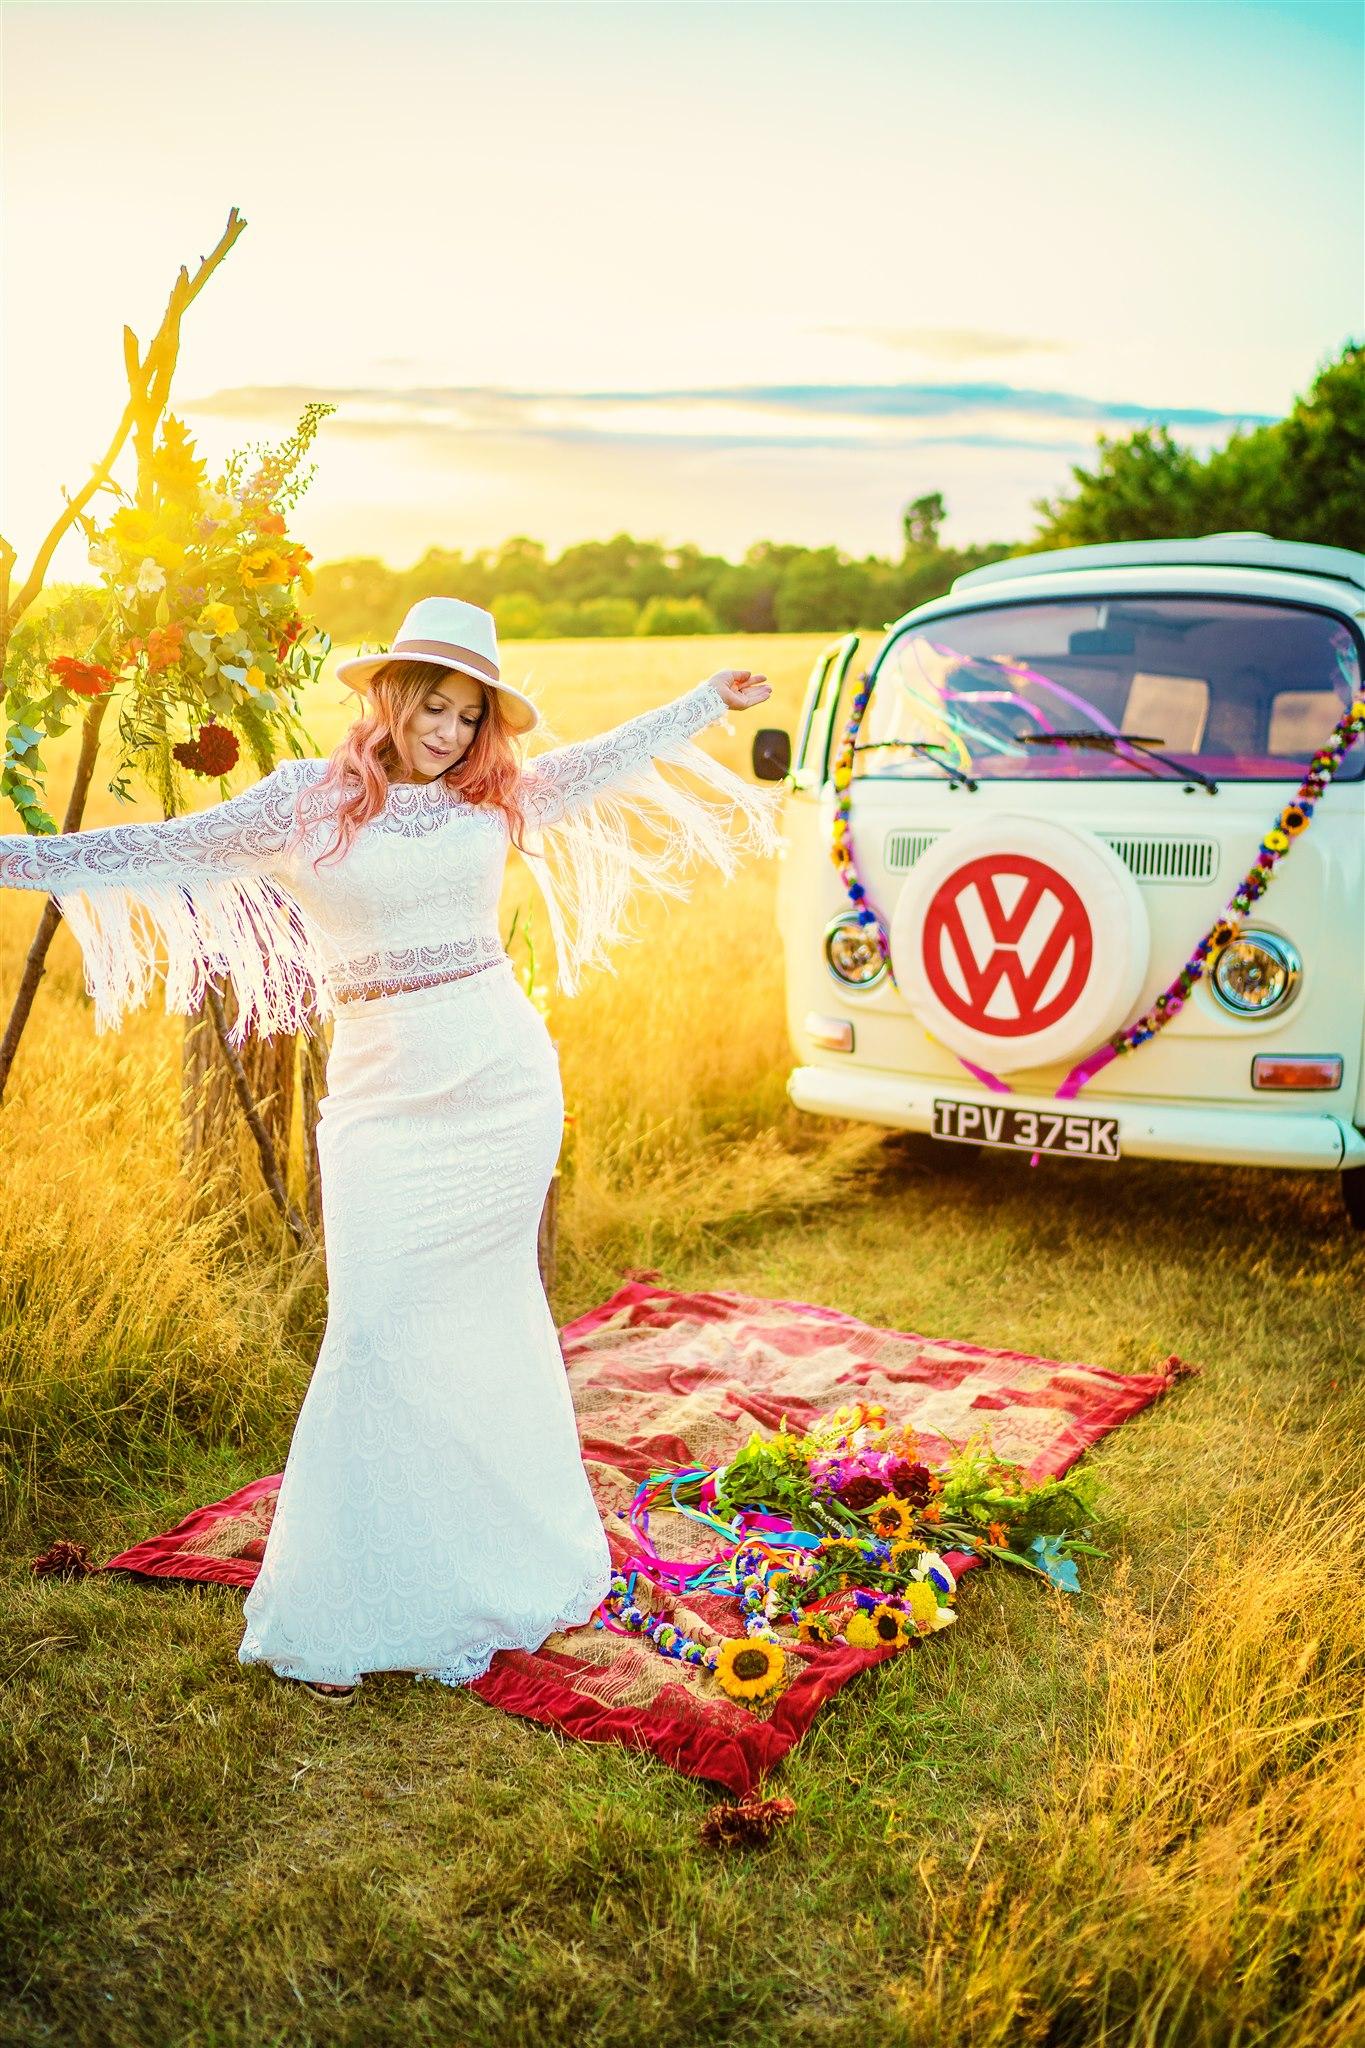 70s wedding dress with tassels - unique bridal wear - colourful bohemian wedding - 70s wedding - campervan wedding - hippie wedding